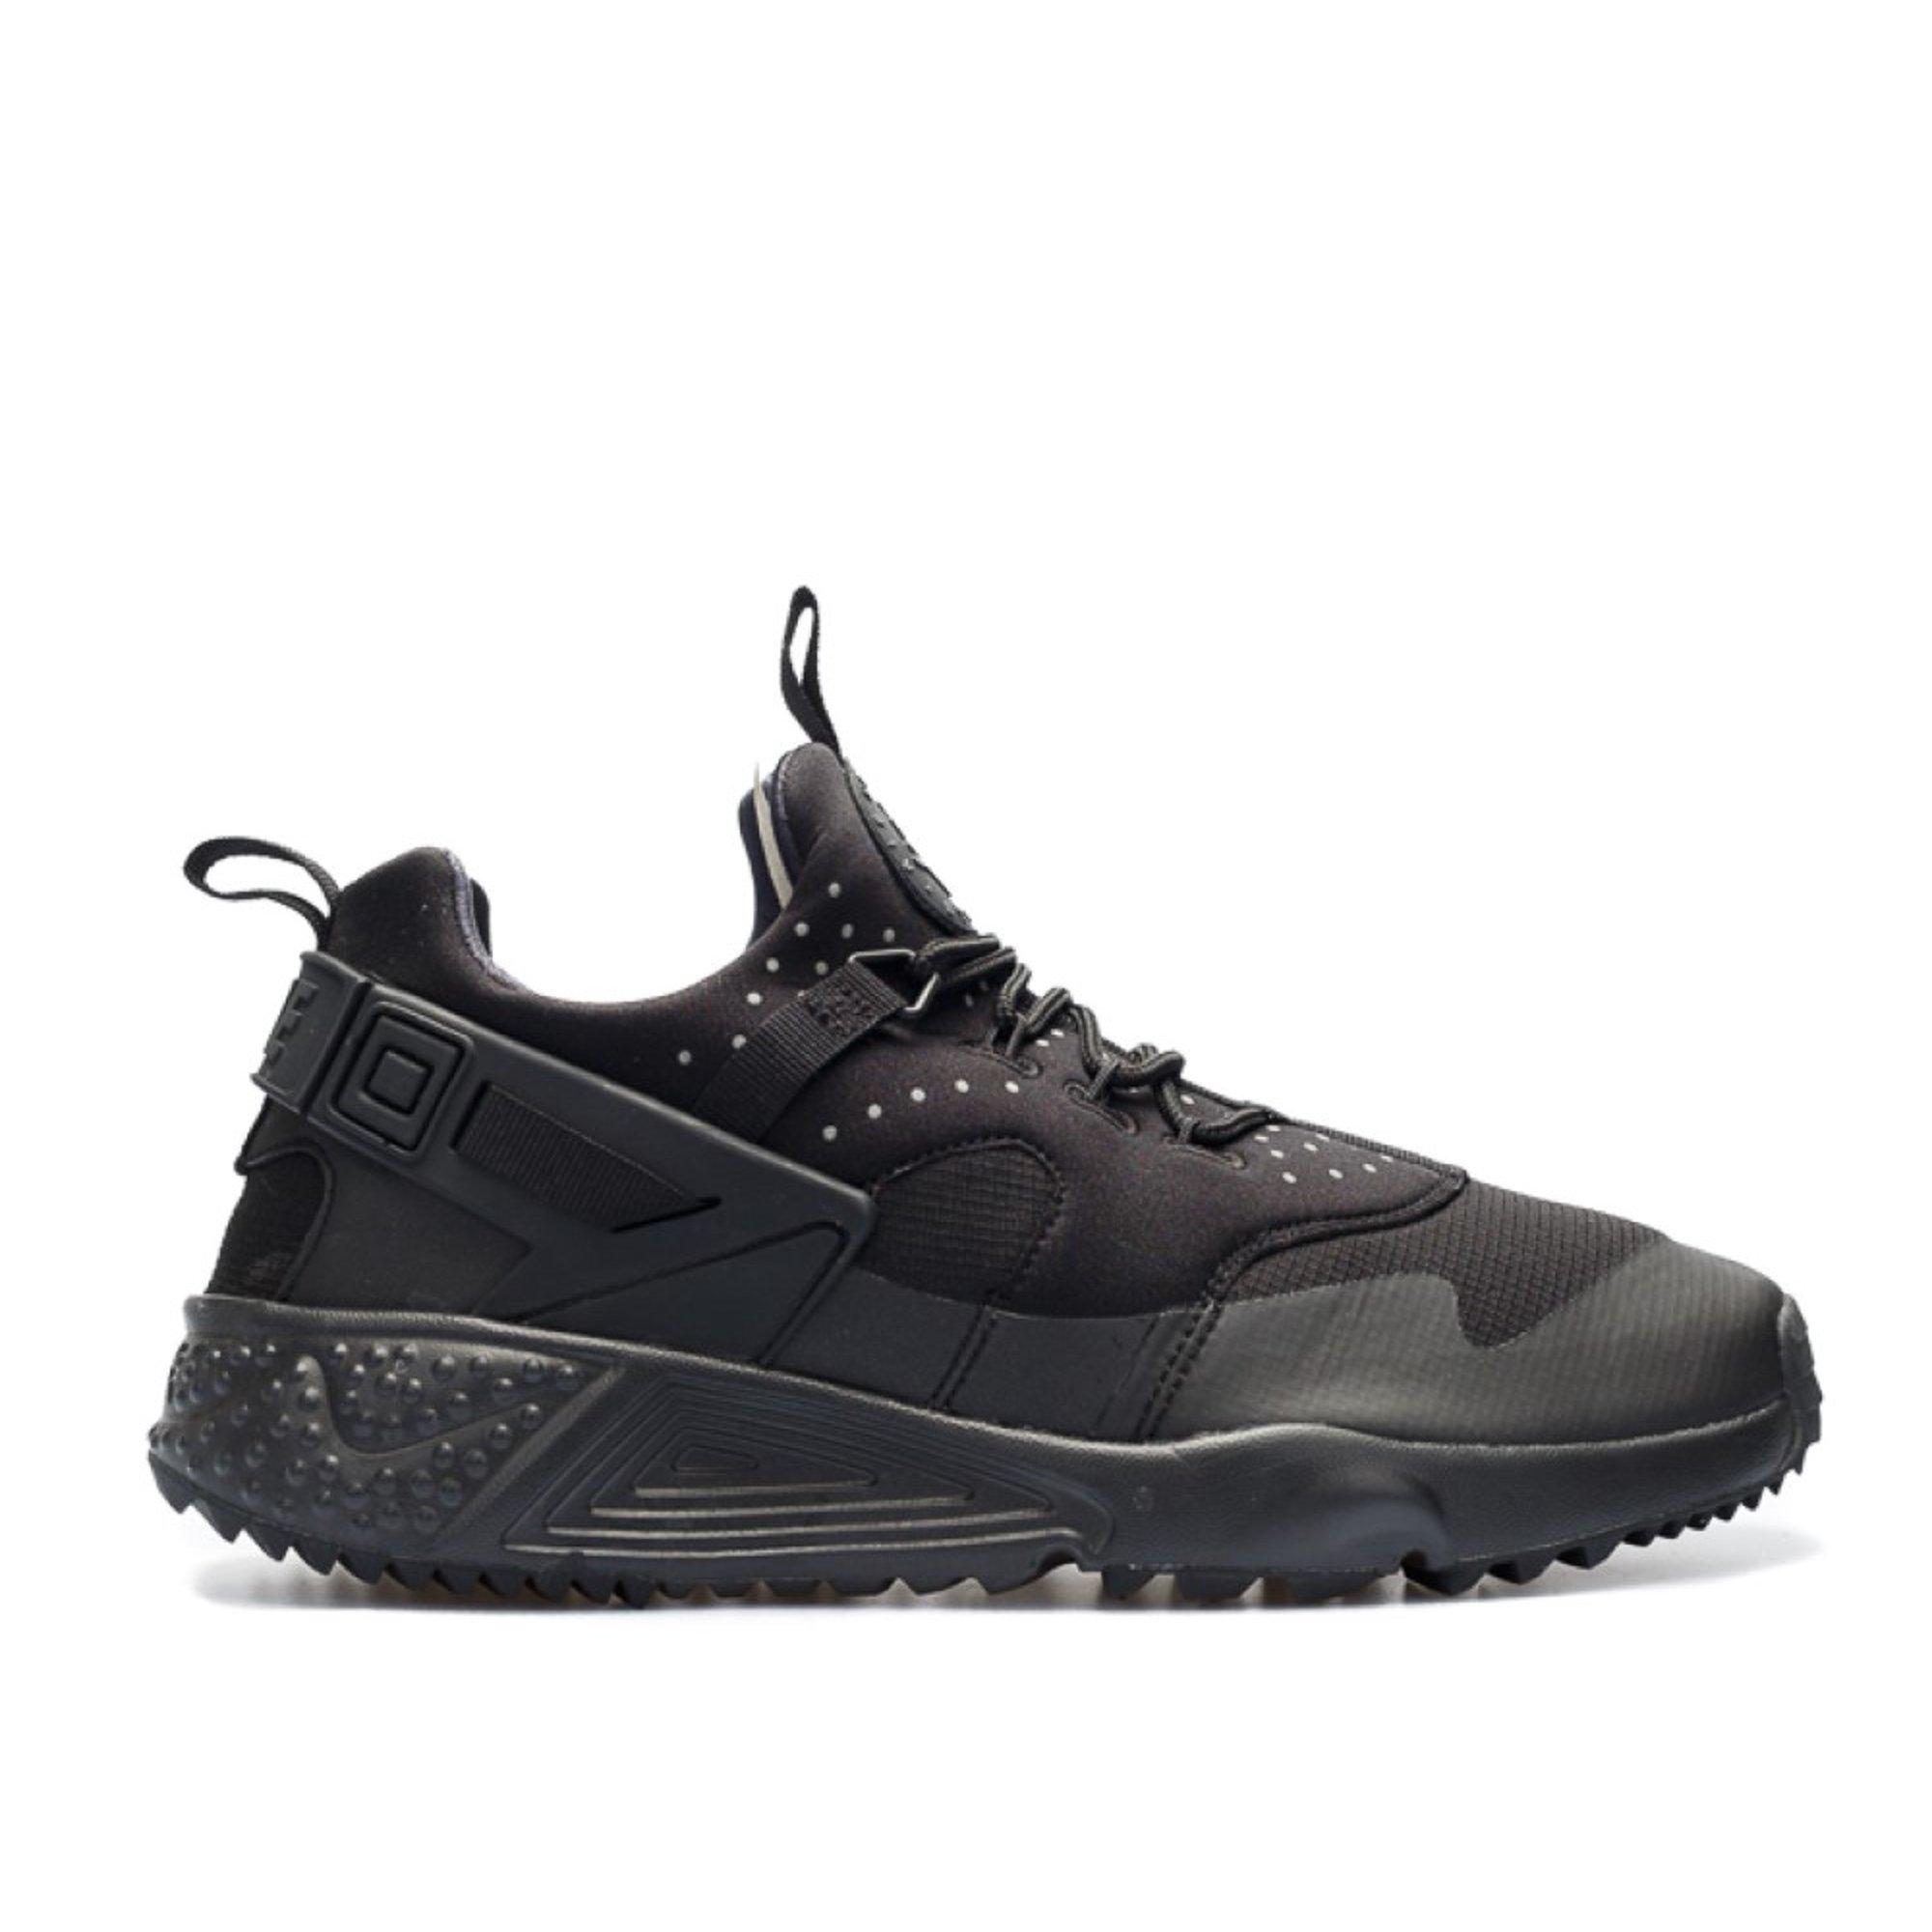 low priced 4ac1b f03ca Nike - Men - Nike Air Huarache Utility - 806807-002 - Size 8   Walmart  Canada